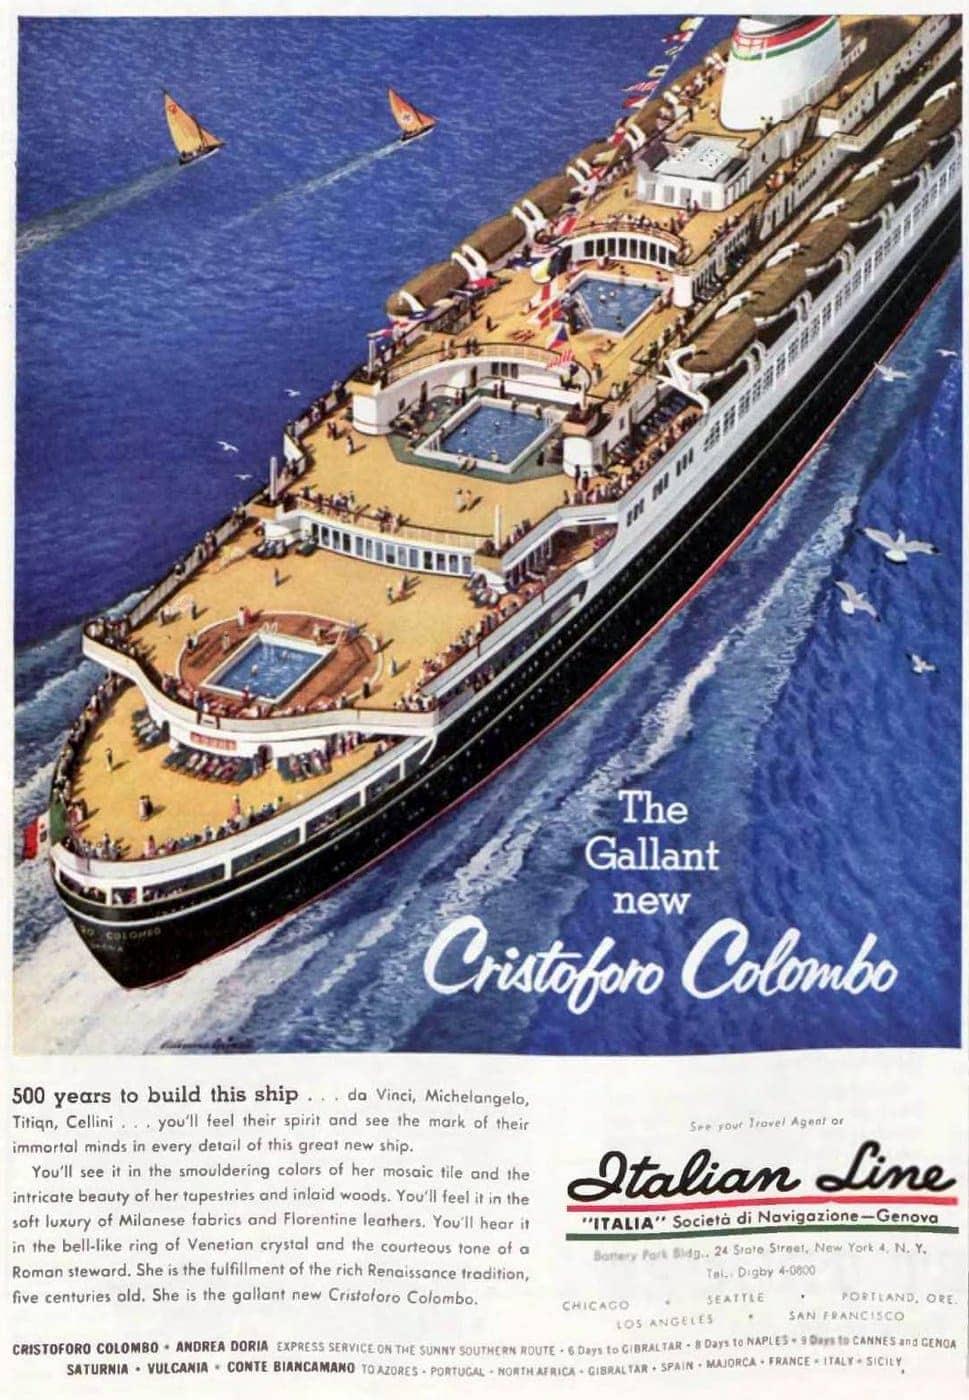 Italian cruise line - Cristoforo Colombo 1954